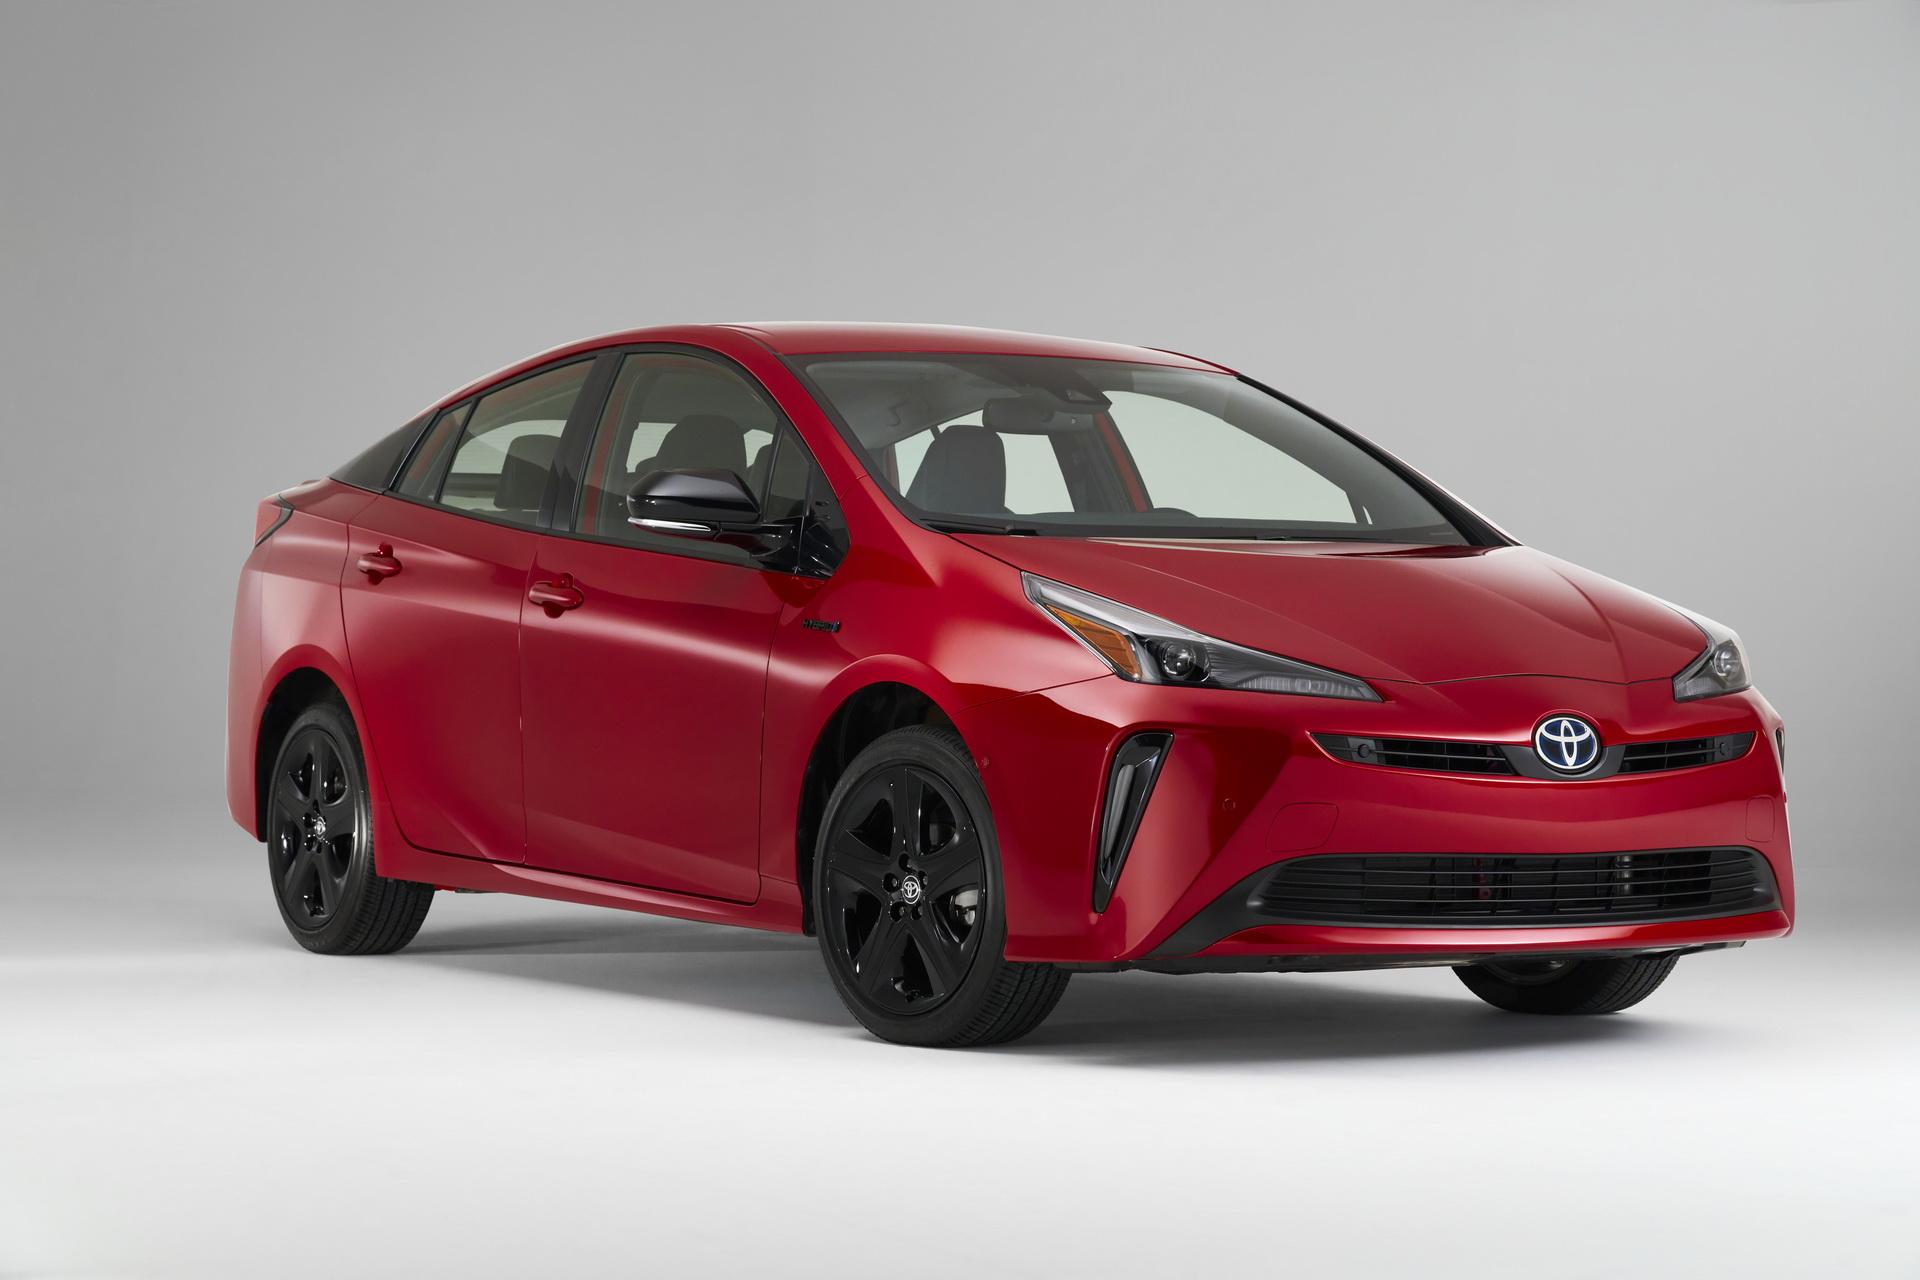 Toyota-Prius-2020-Edition-1